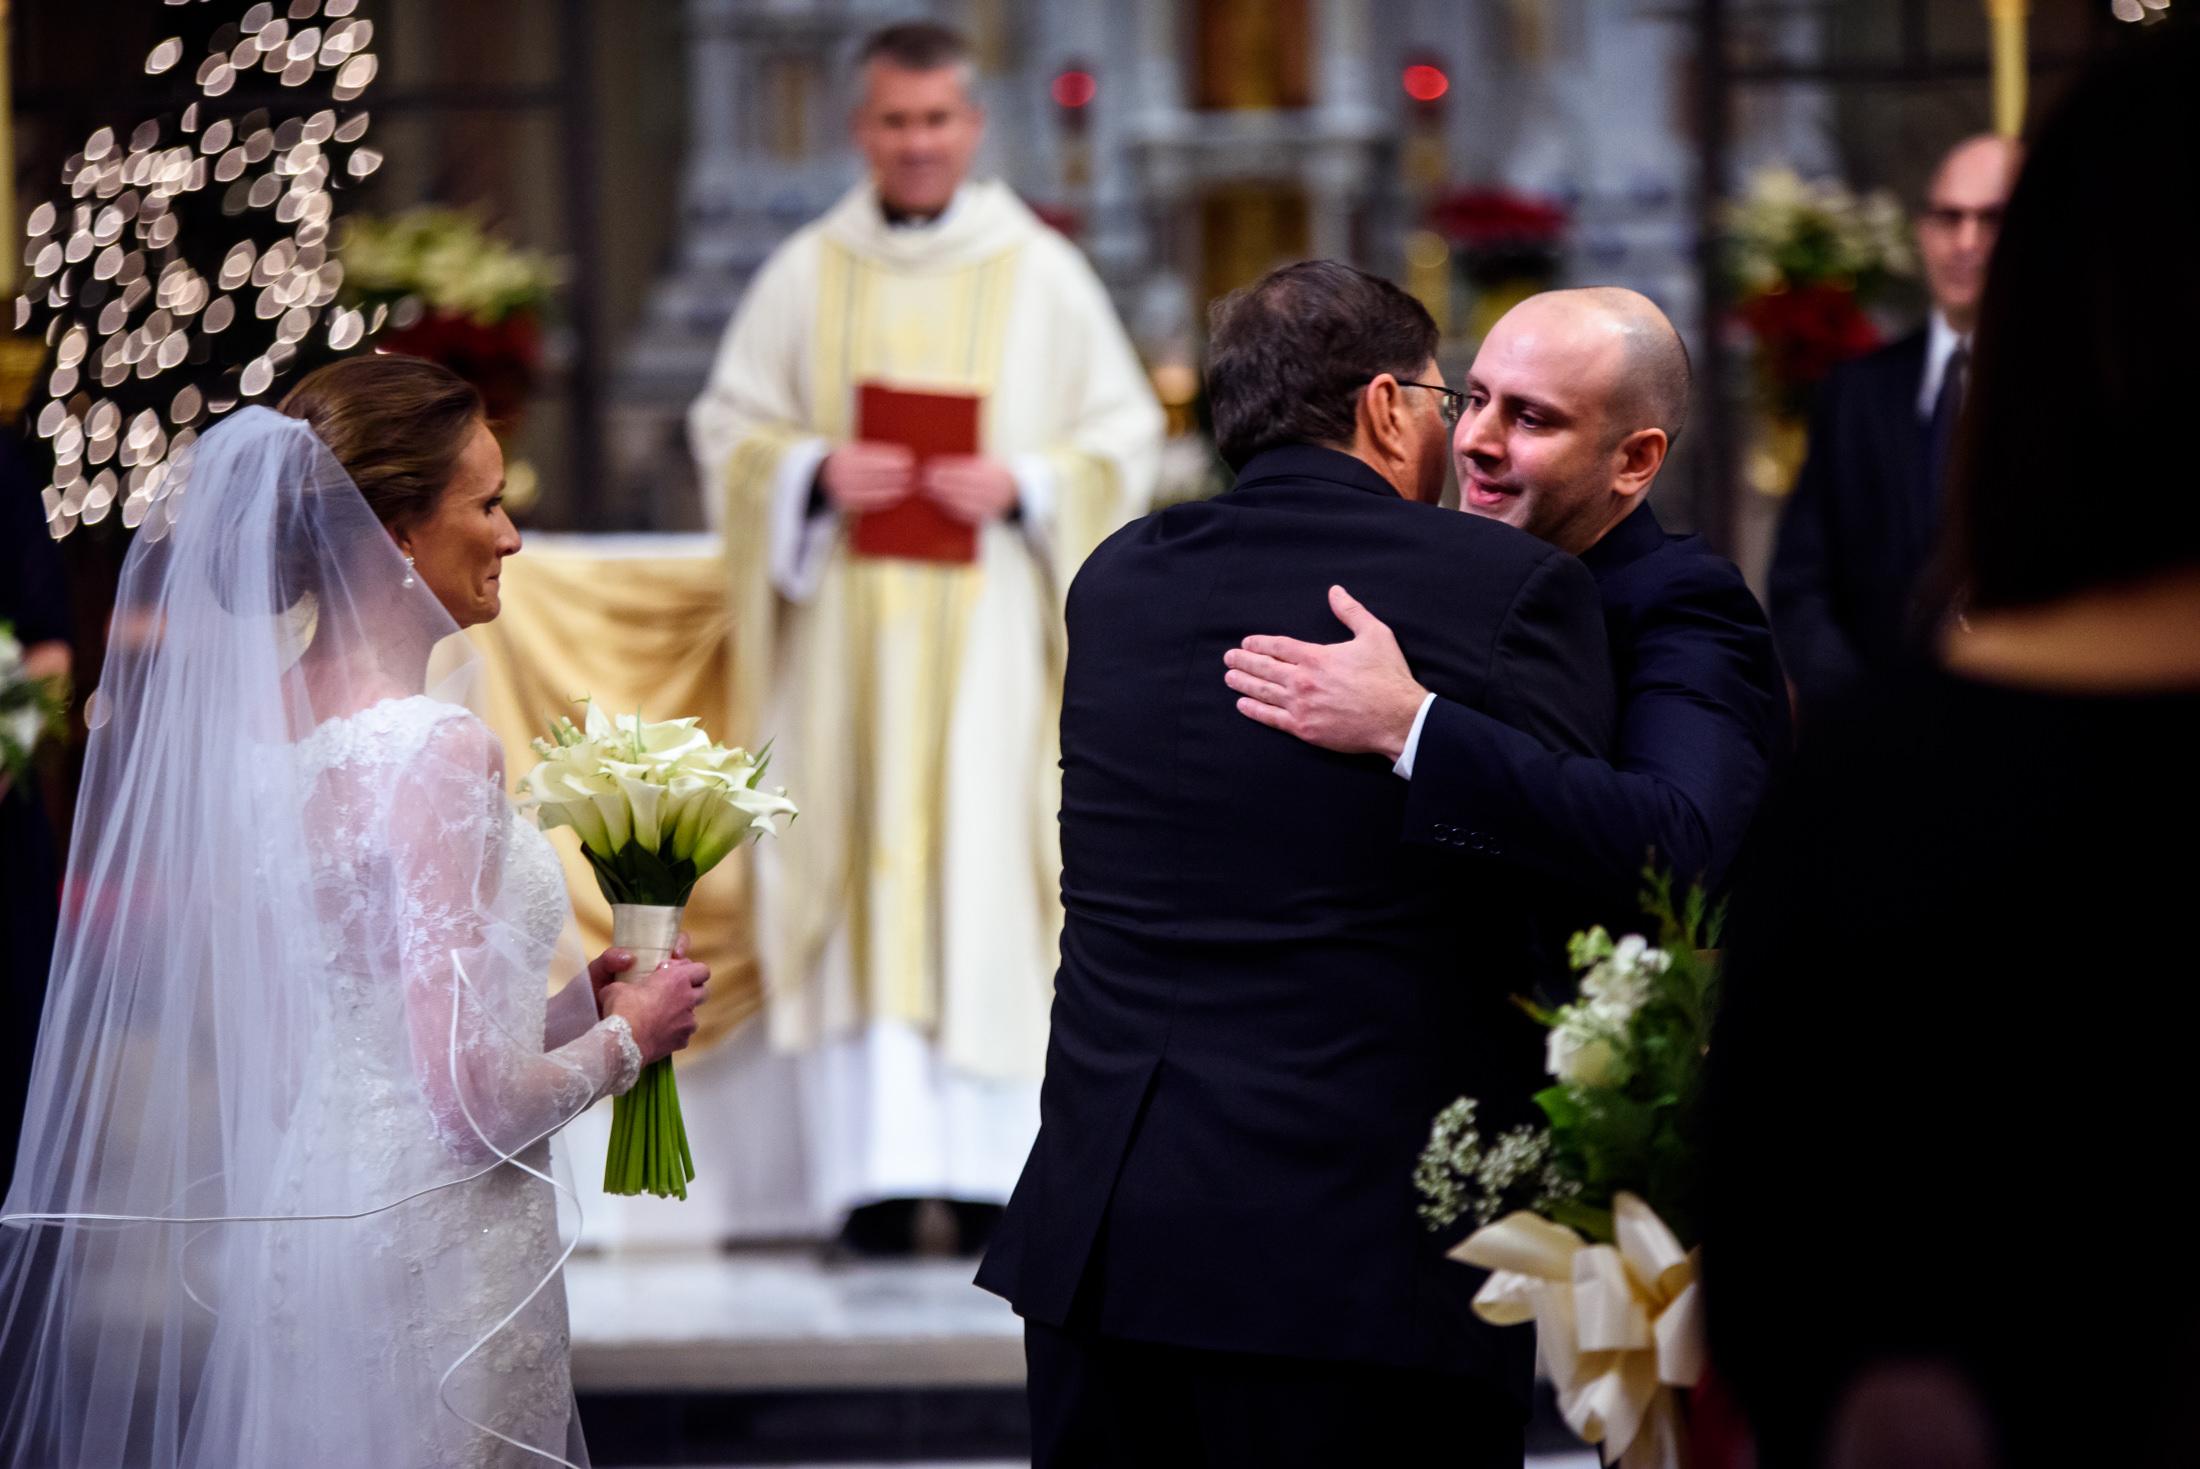 st-johns-creighton-omaha-wedding-photographer-jm-studios-0008.JPG